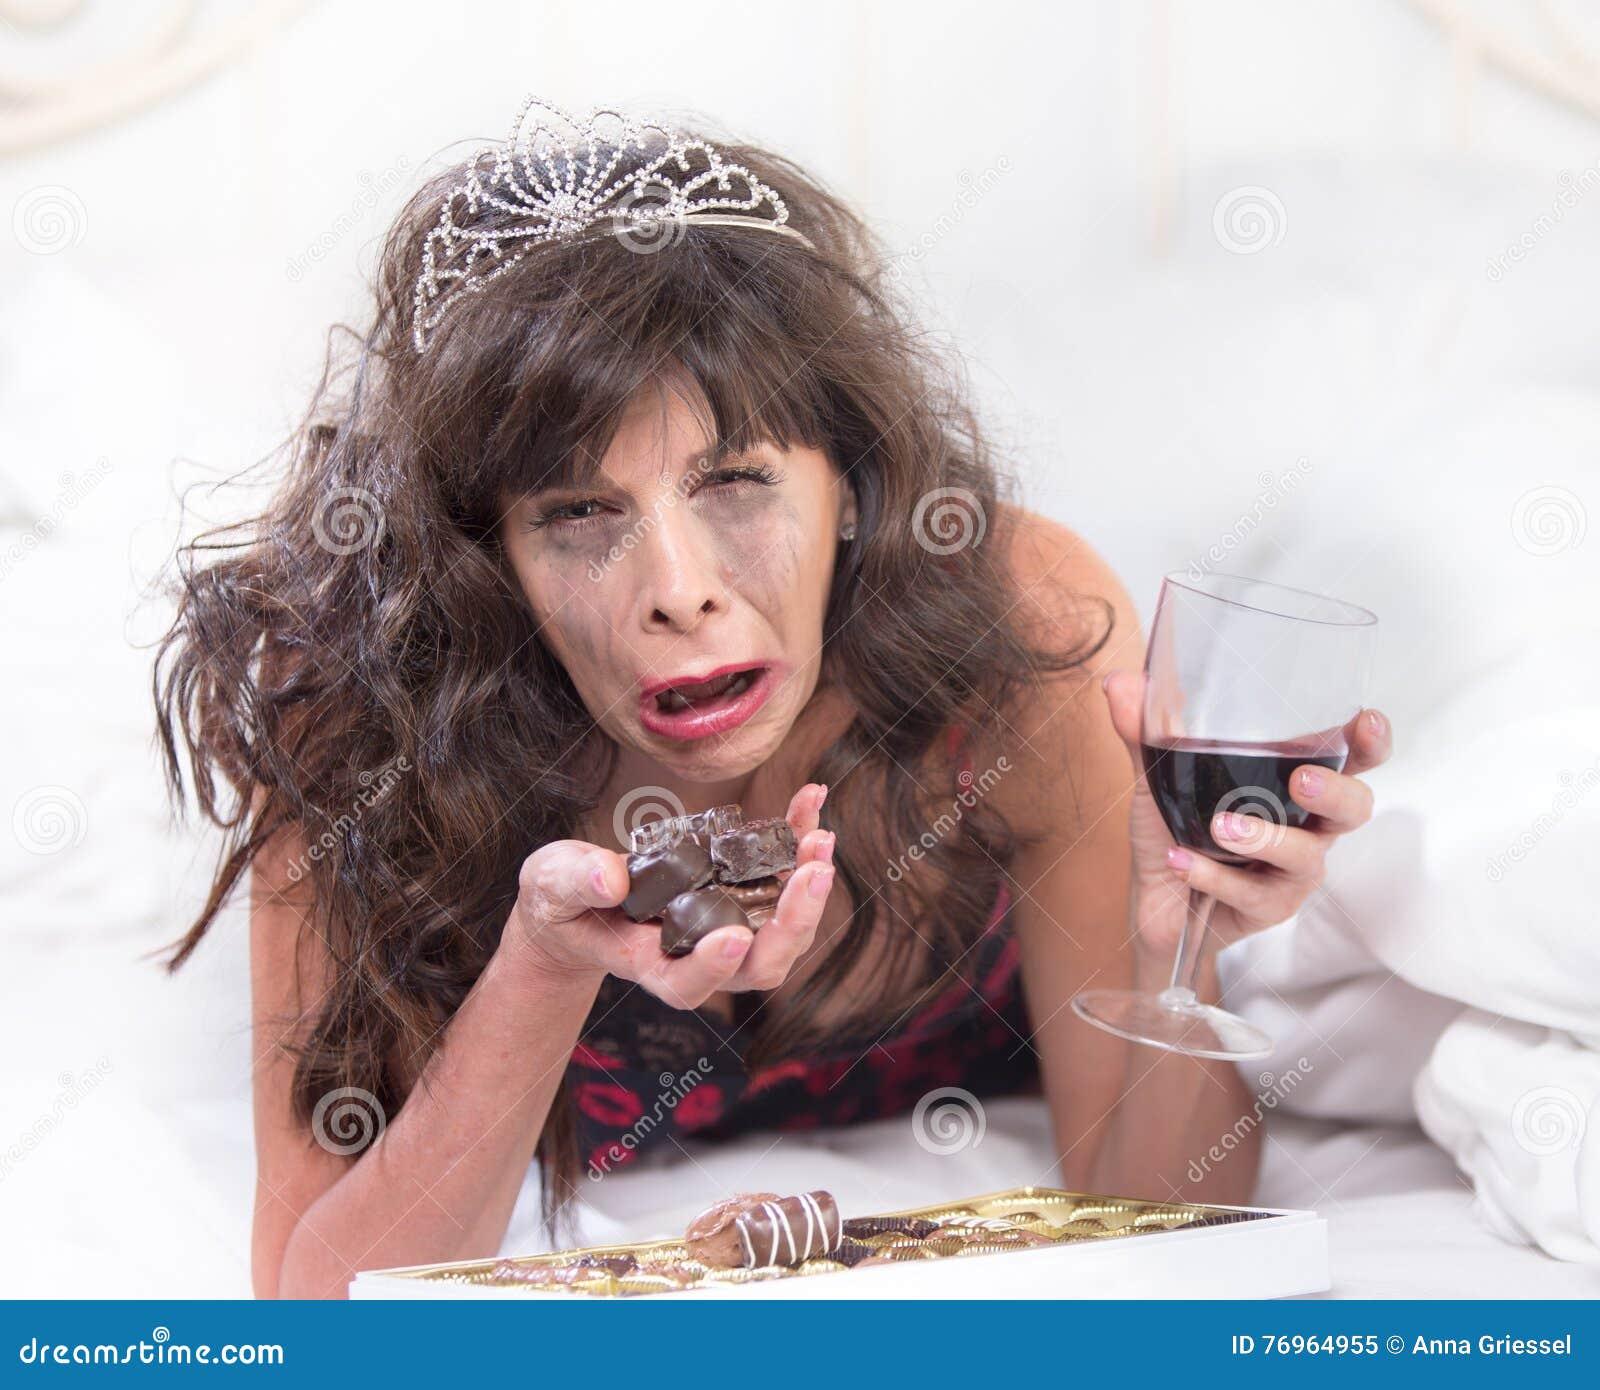 sobbing woman in tiara drinking wine and cramming chocolates in